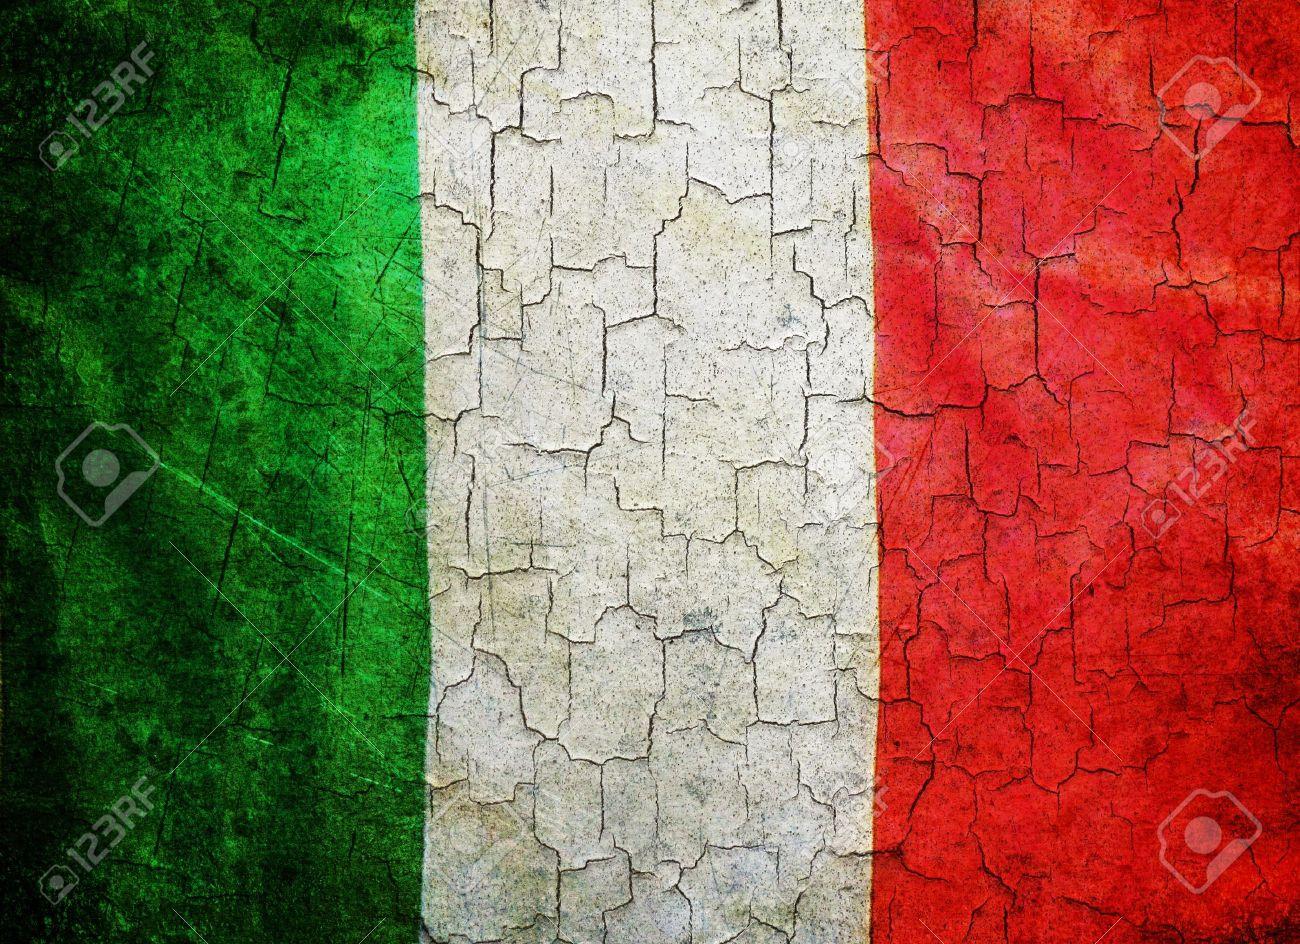 Italy flag on a cracked grunge background - 12066299